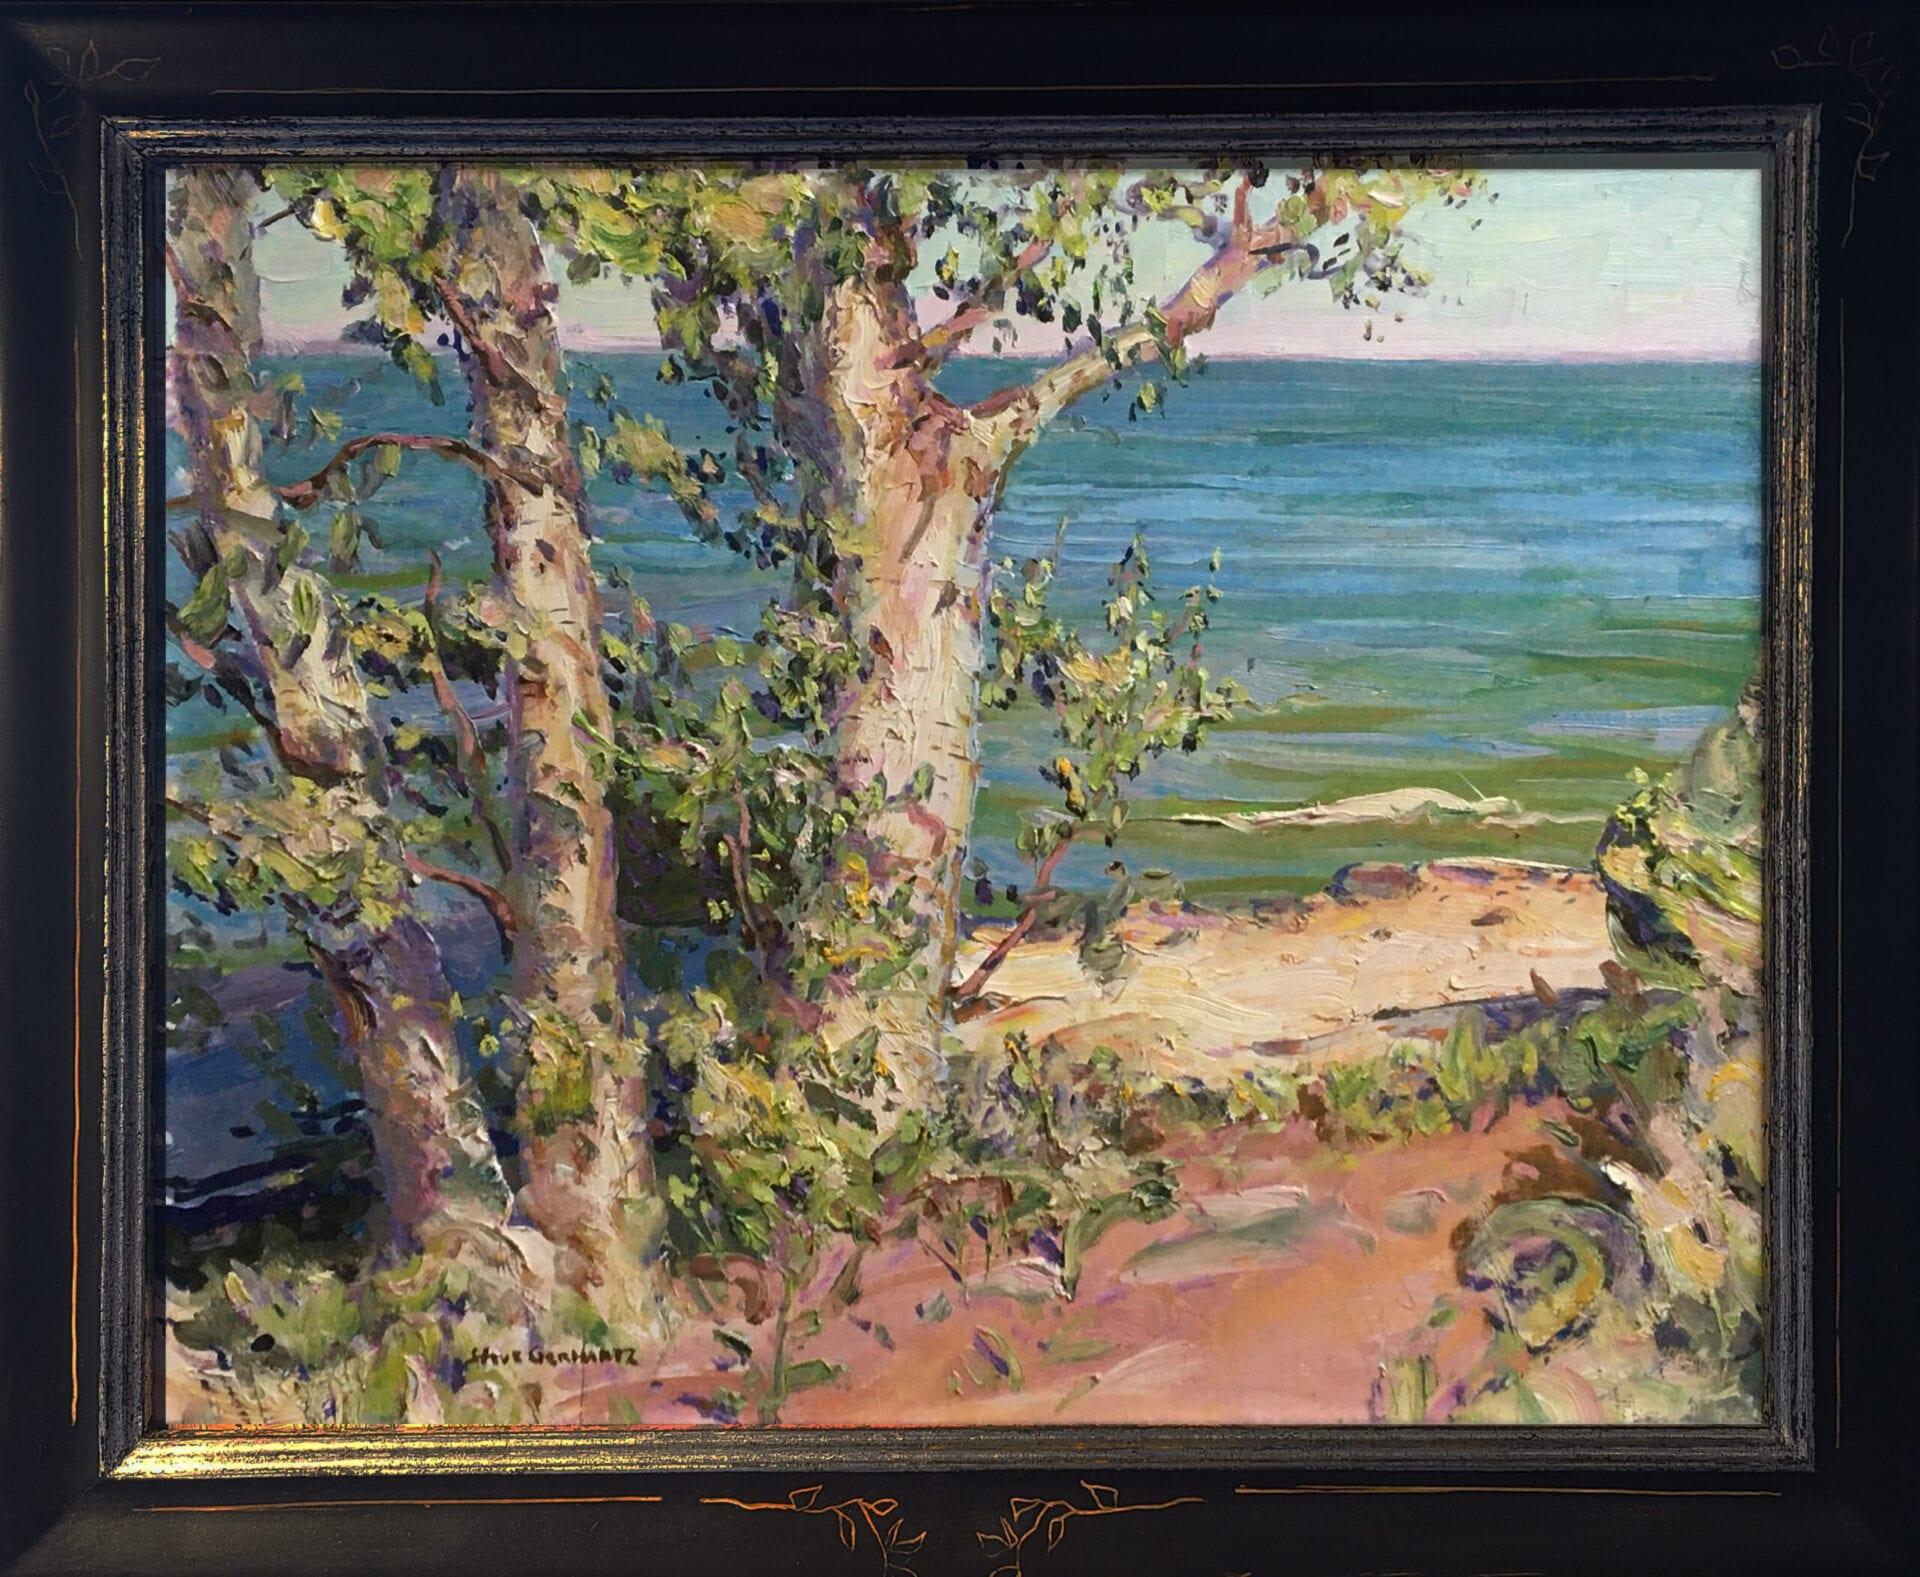 Gerhartz_Birches_at_the_Beach_Frame